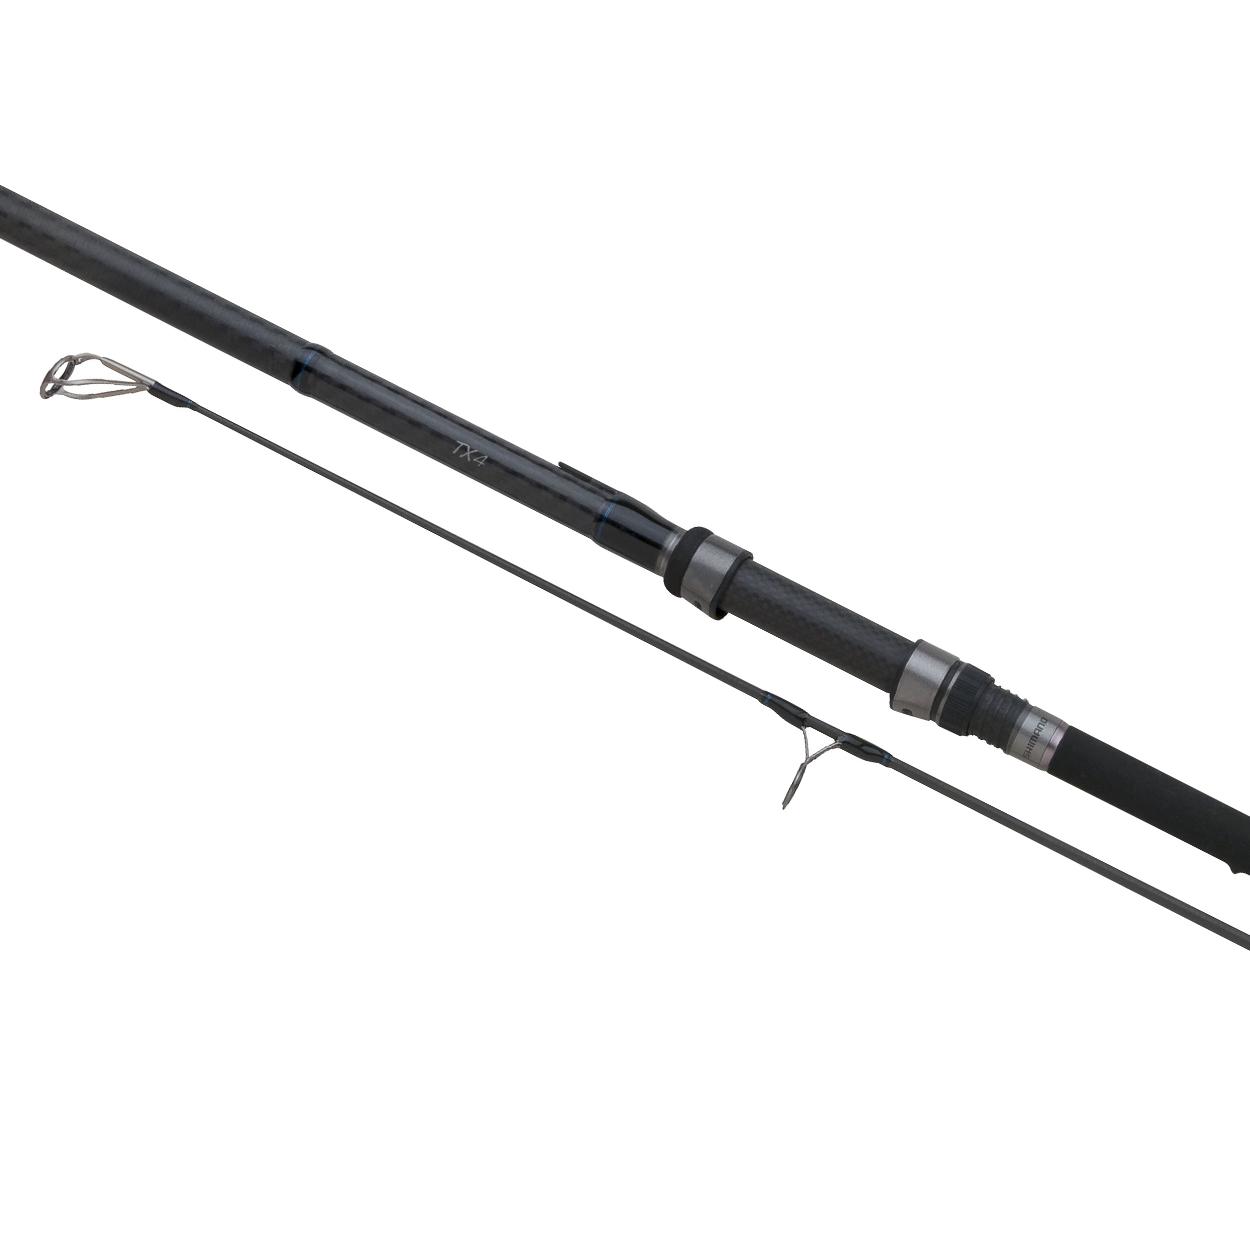 цена на Удилище карповое SHIMANO TRIBAL TX-4 12-325 (+ Леска в подарок!)